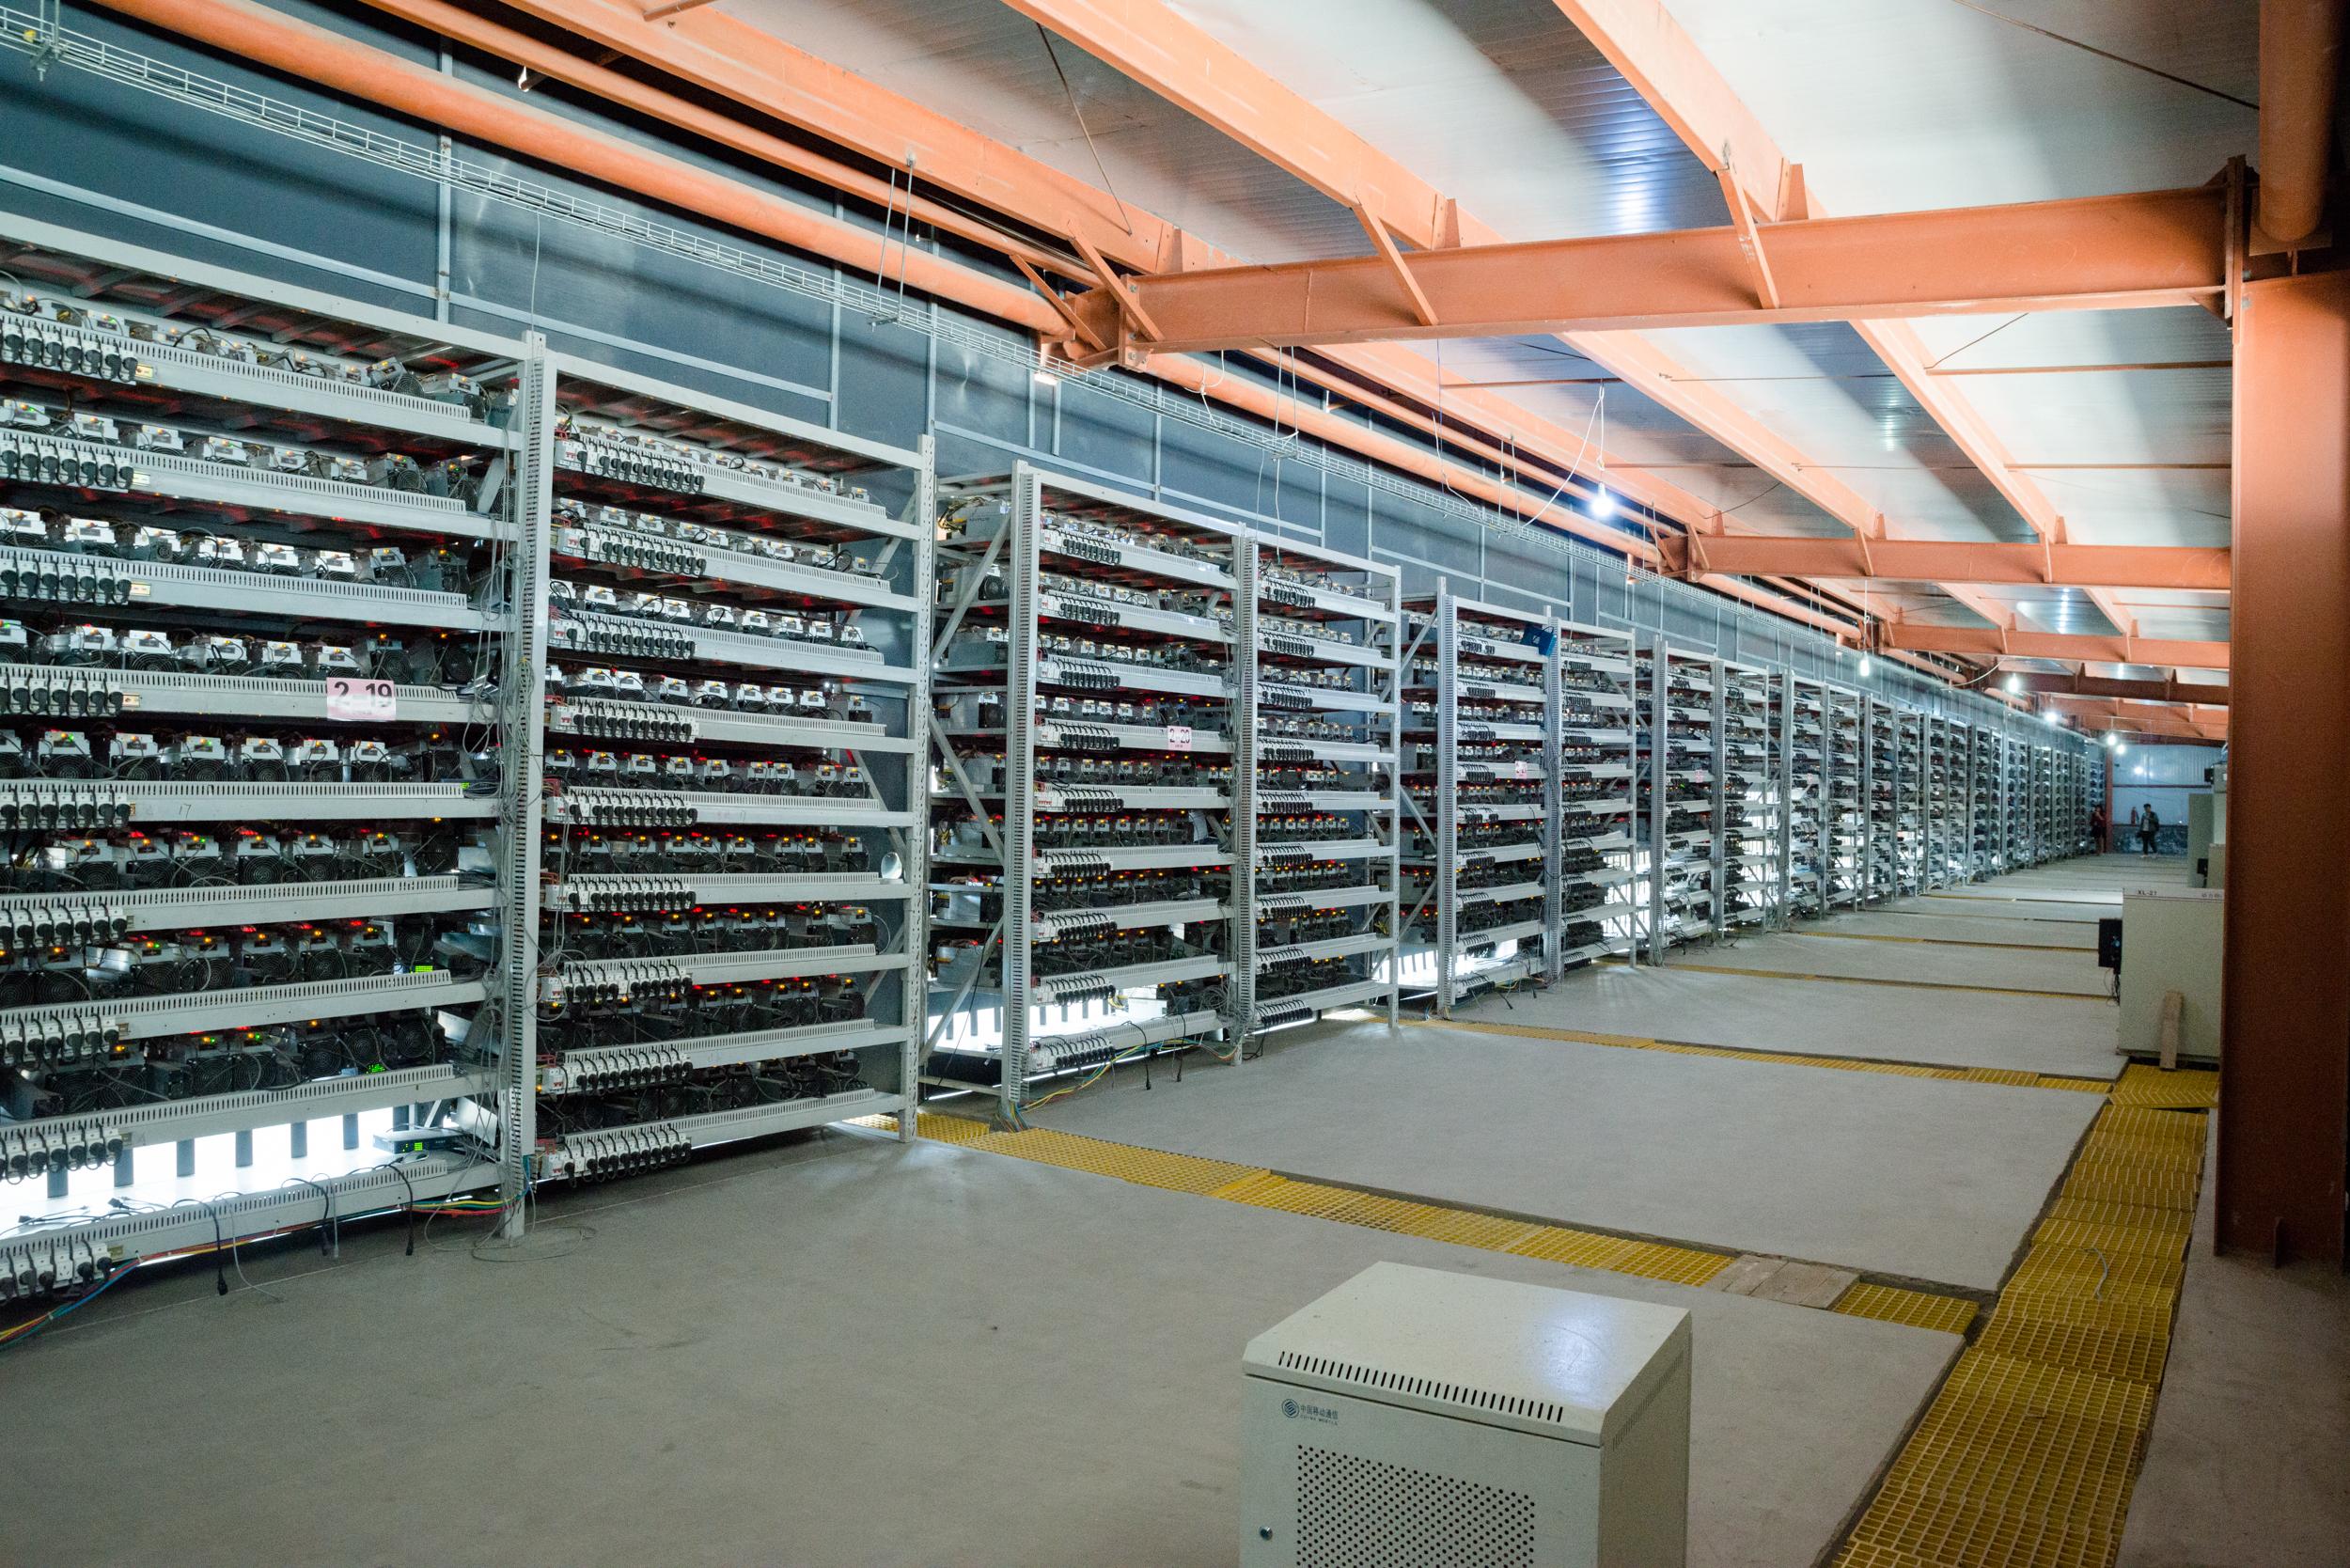 Kgotla o mongwe mining bitcoins fixed odds betting terminals cheats